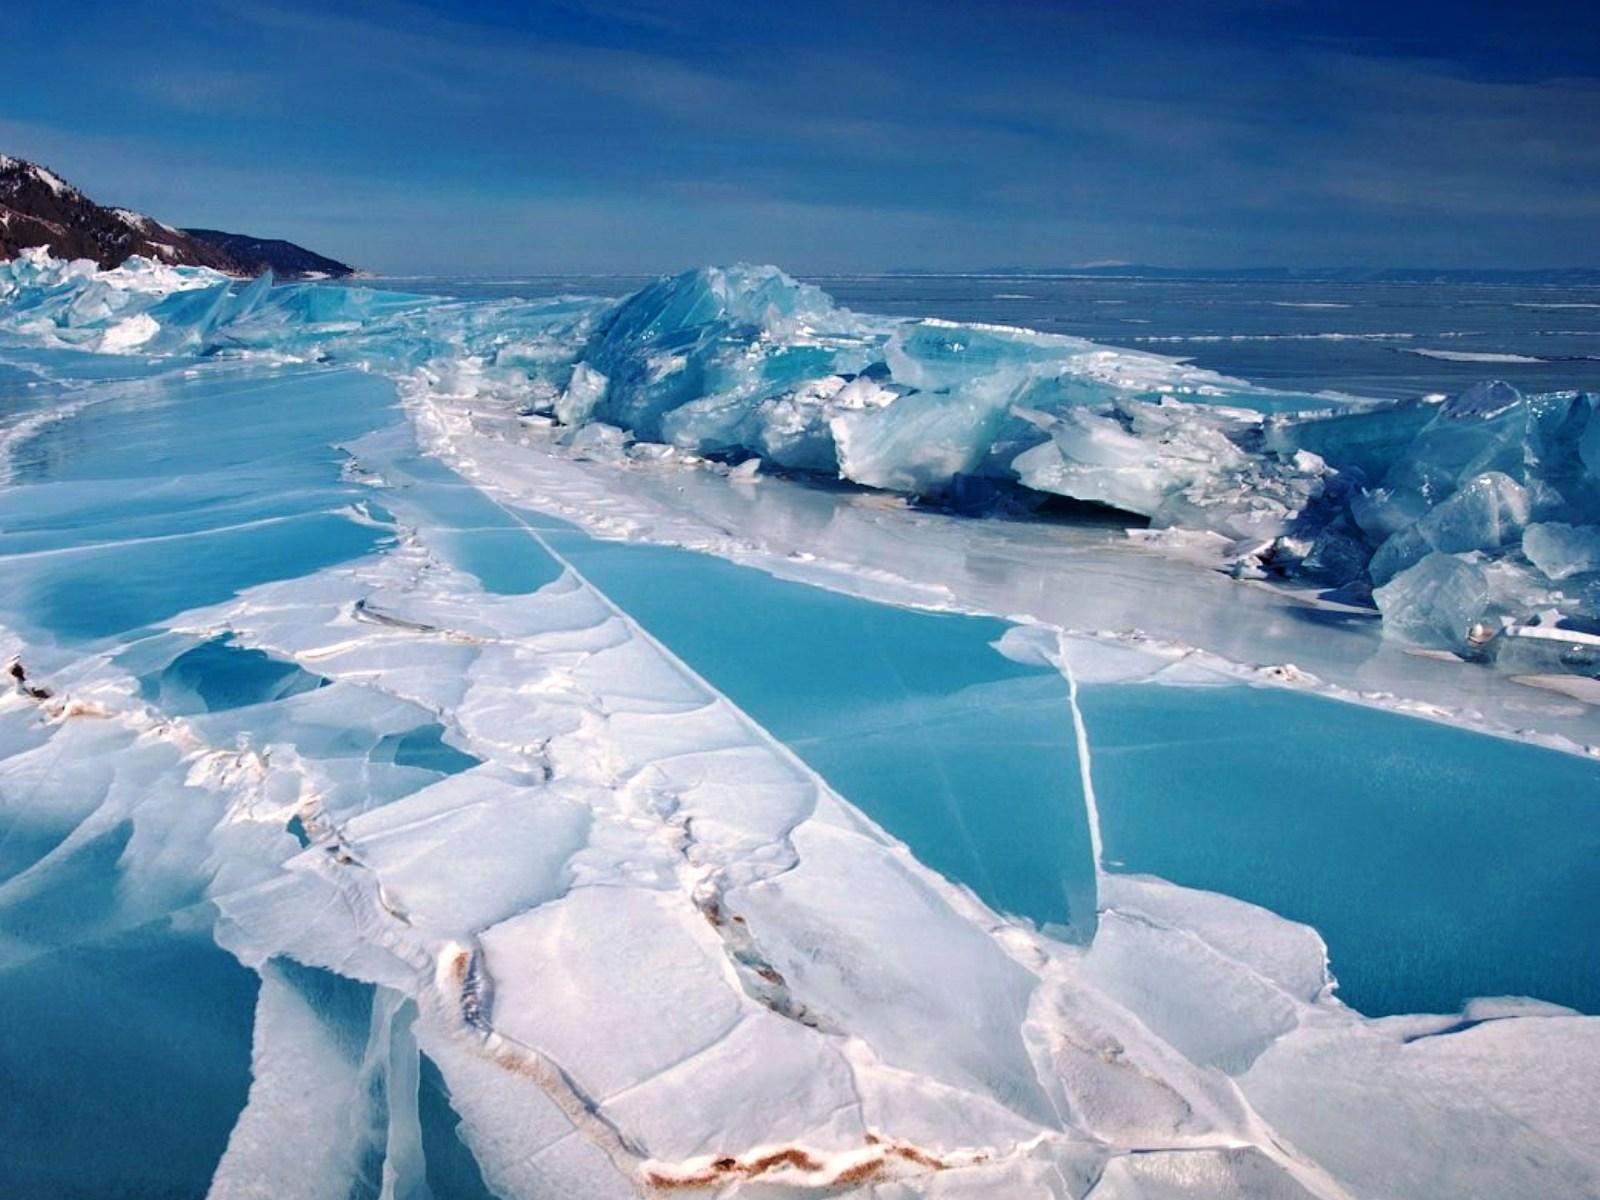 озеро байкал фото зимой